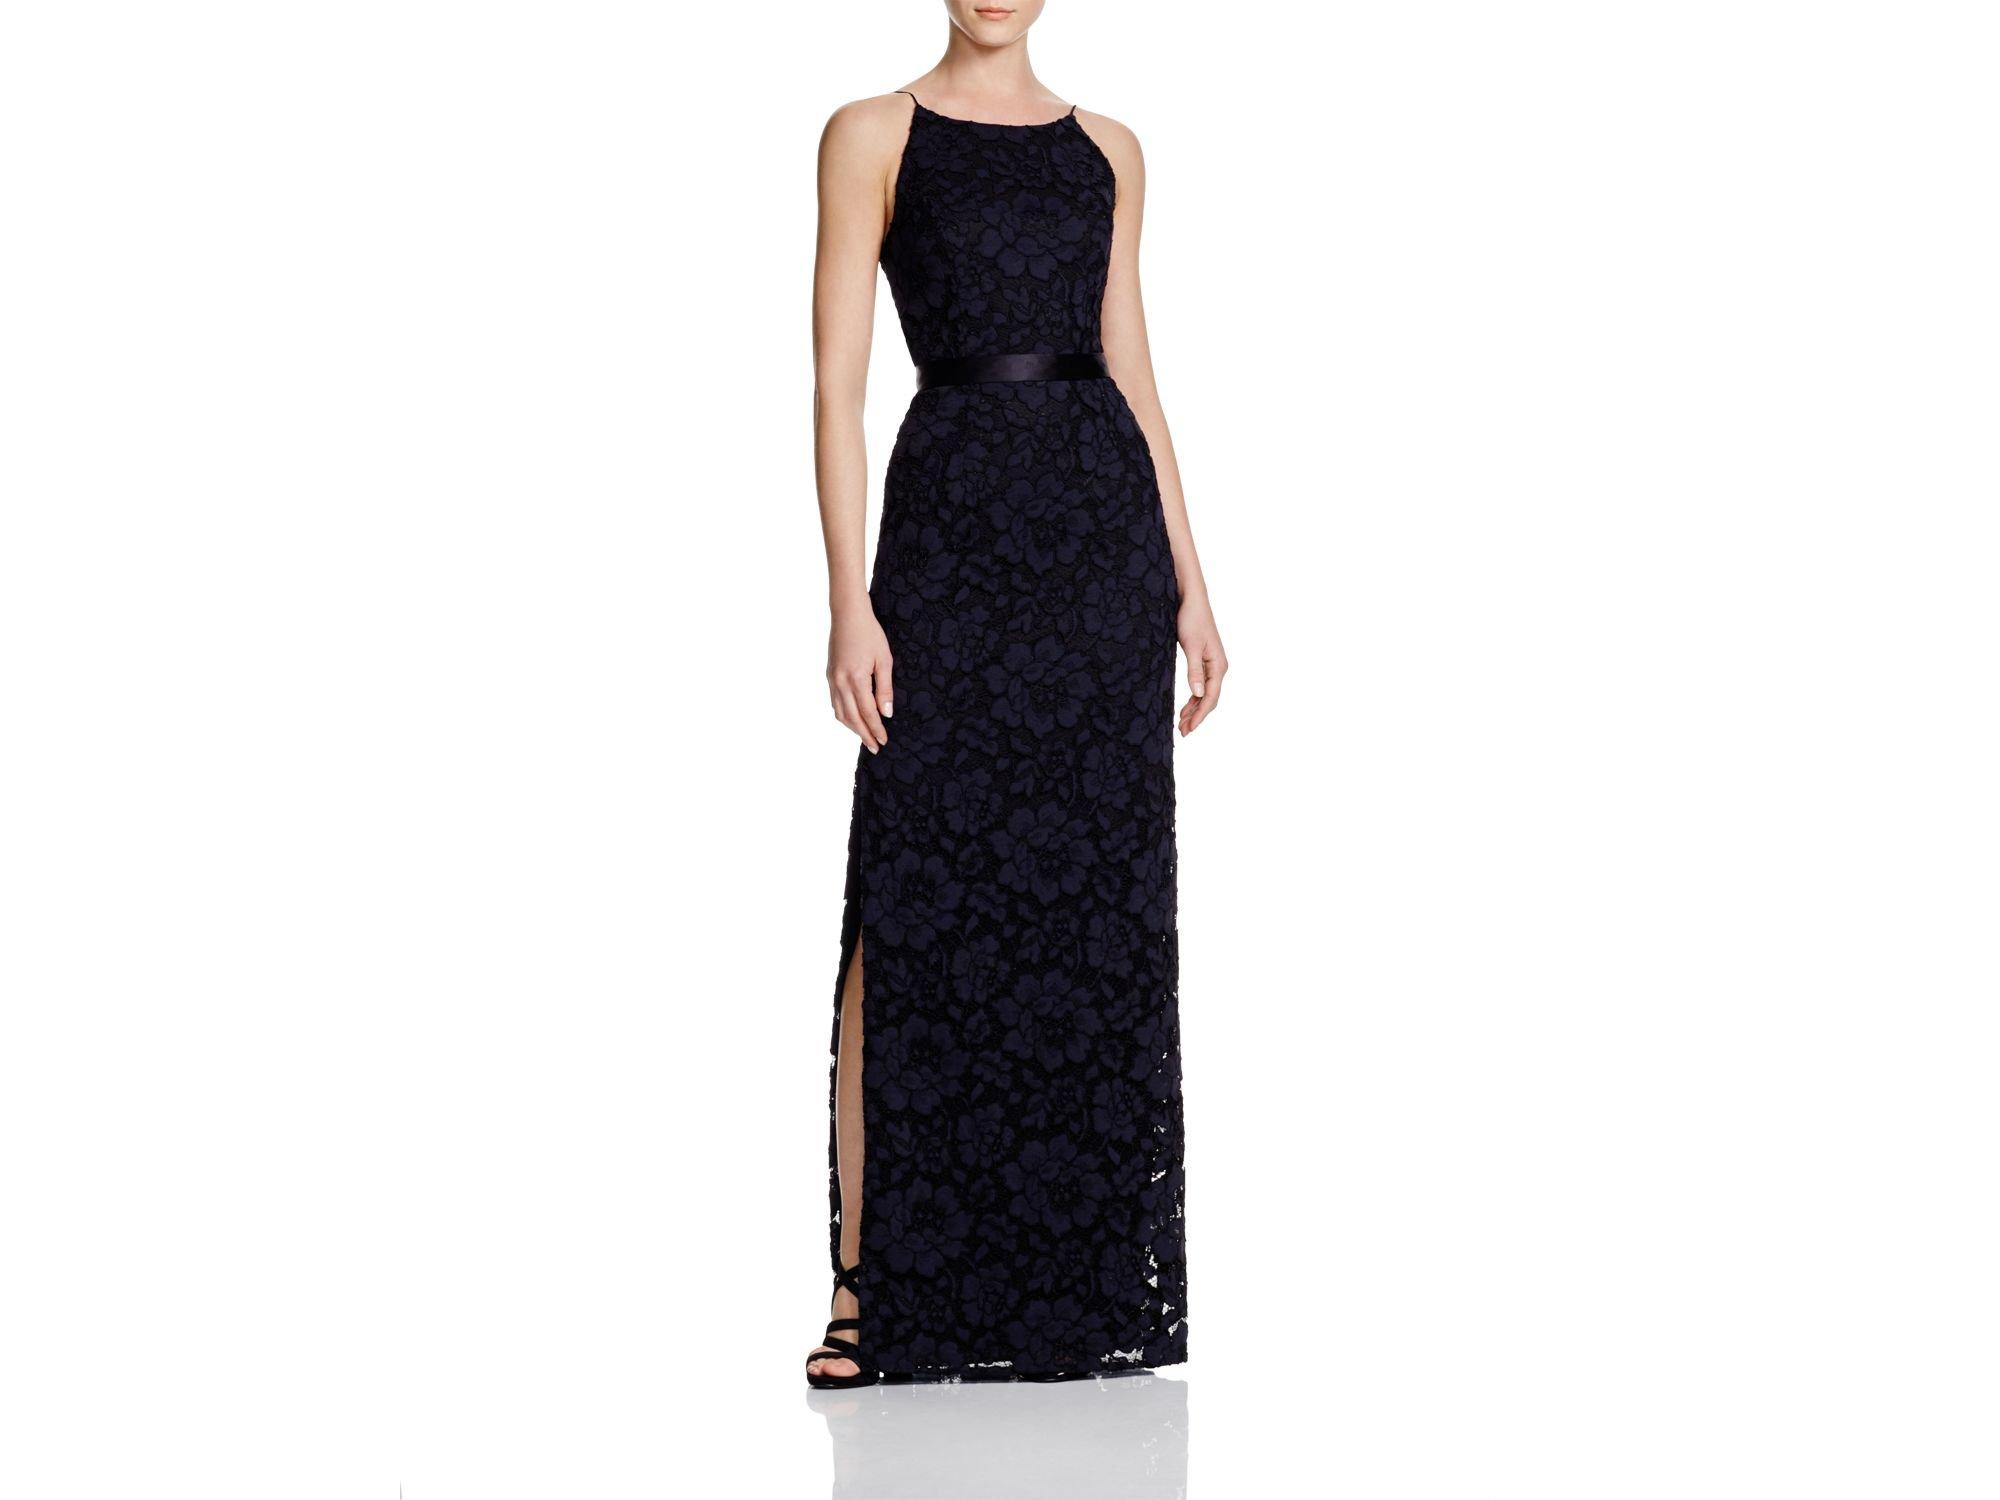 Aidan mattox black dress lace